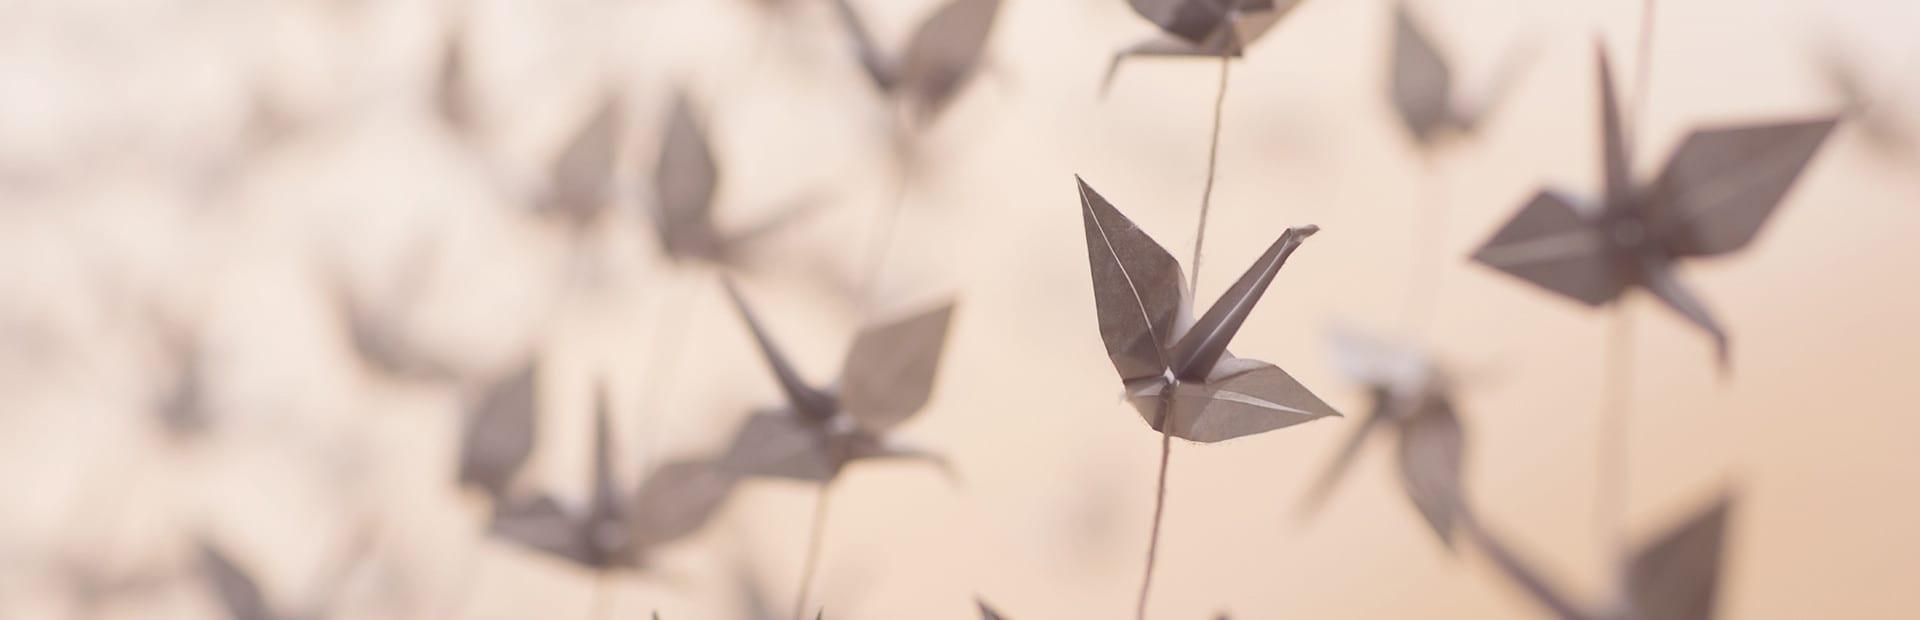 Cran origami